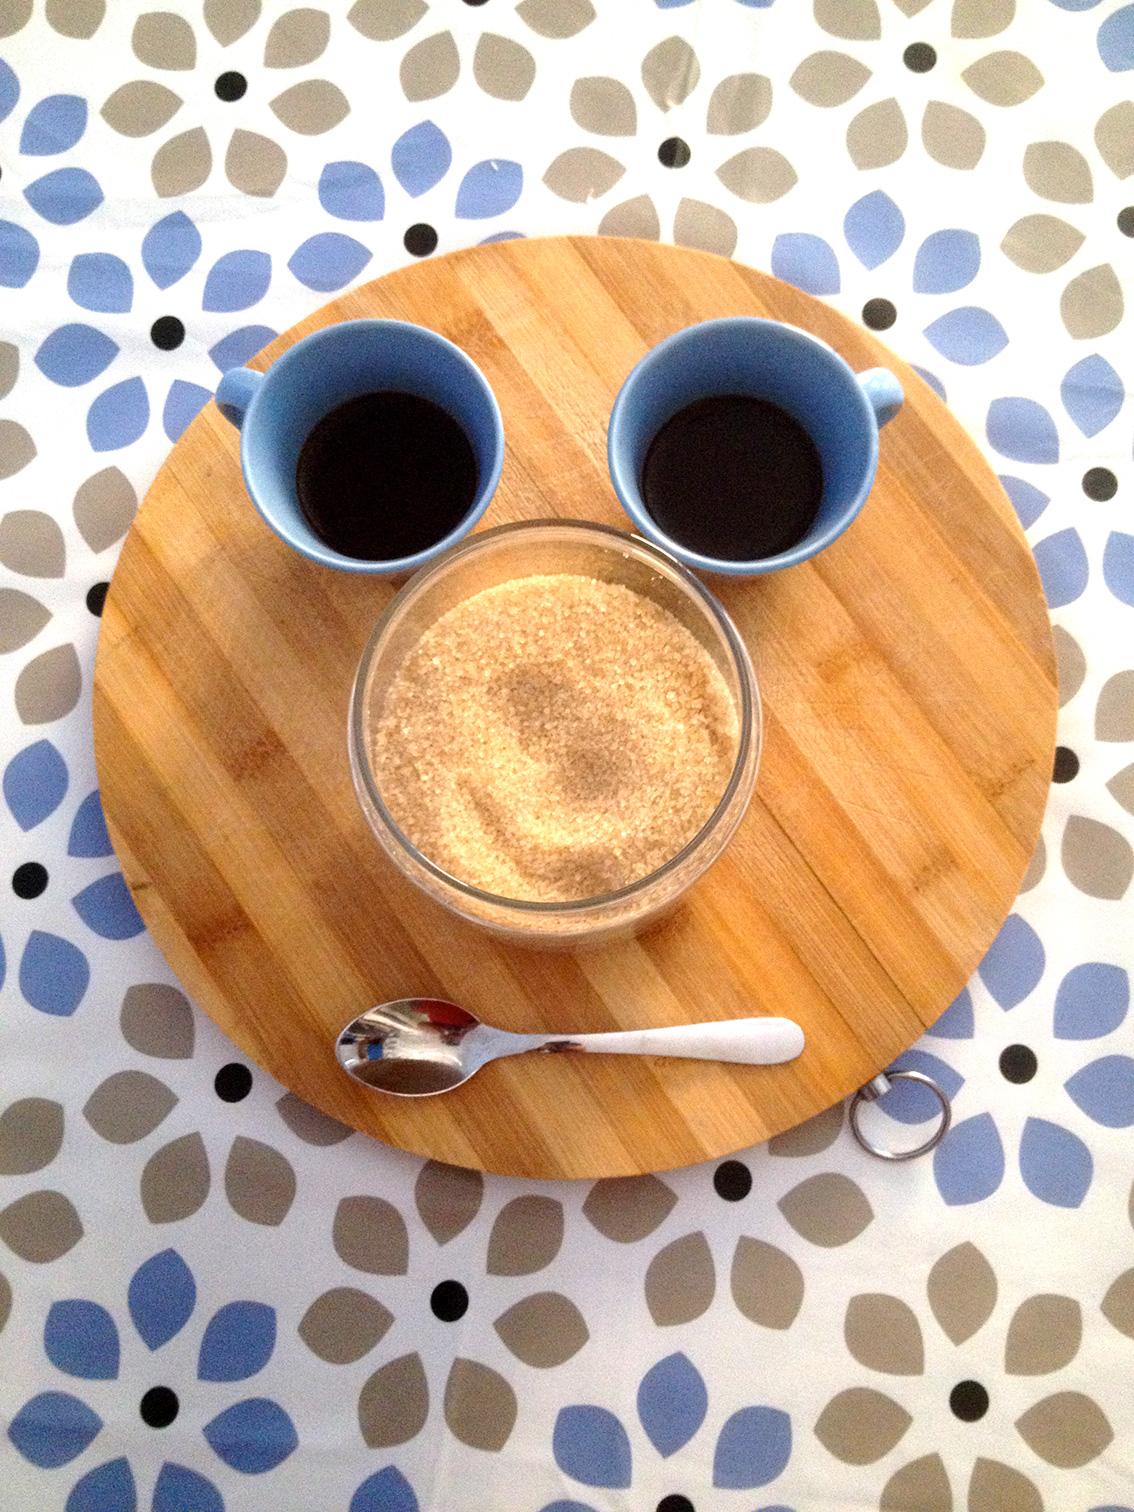 cafefortwo